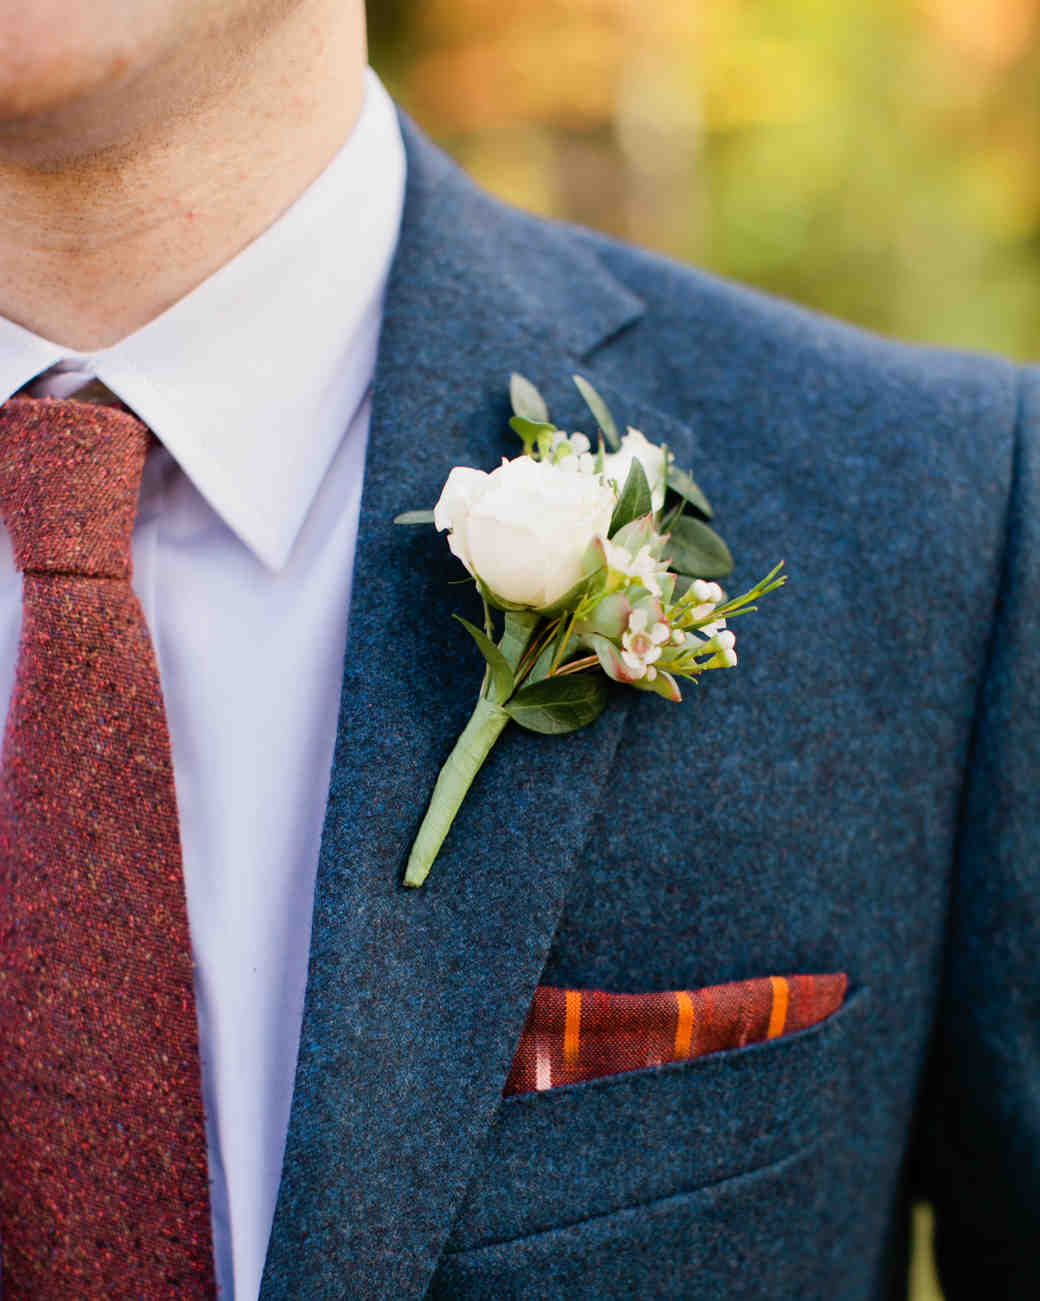 jess-steve-wedding-boutonniere-115-s112362-1115.jpg